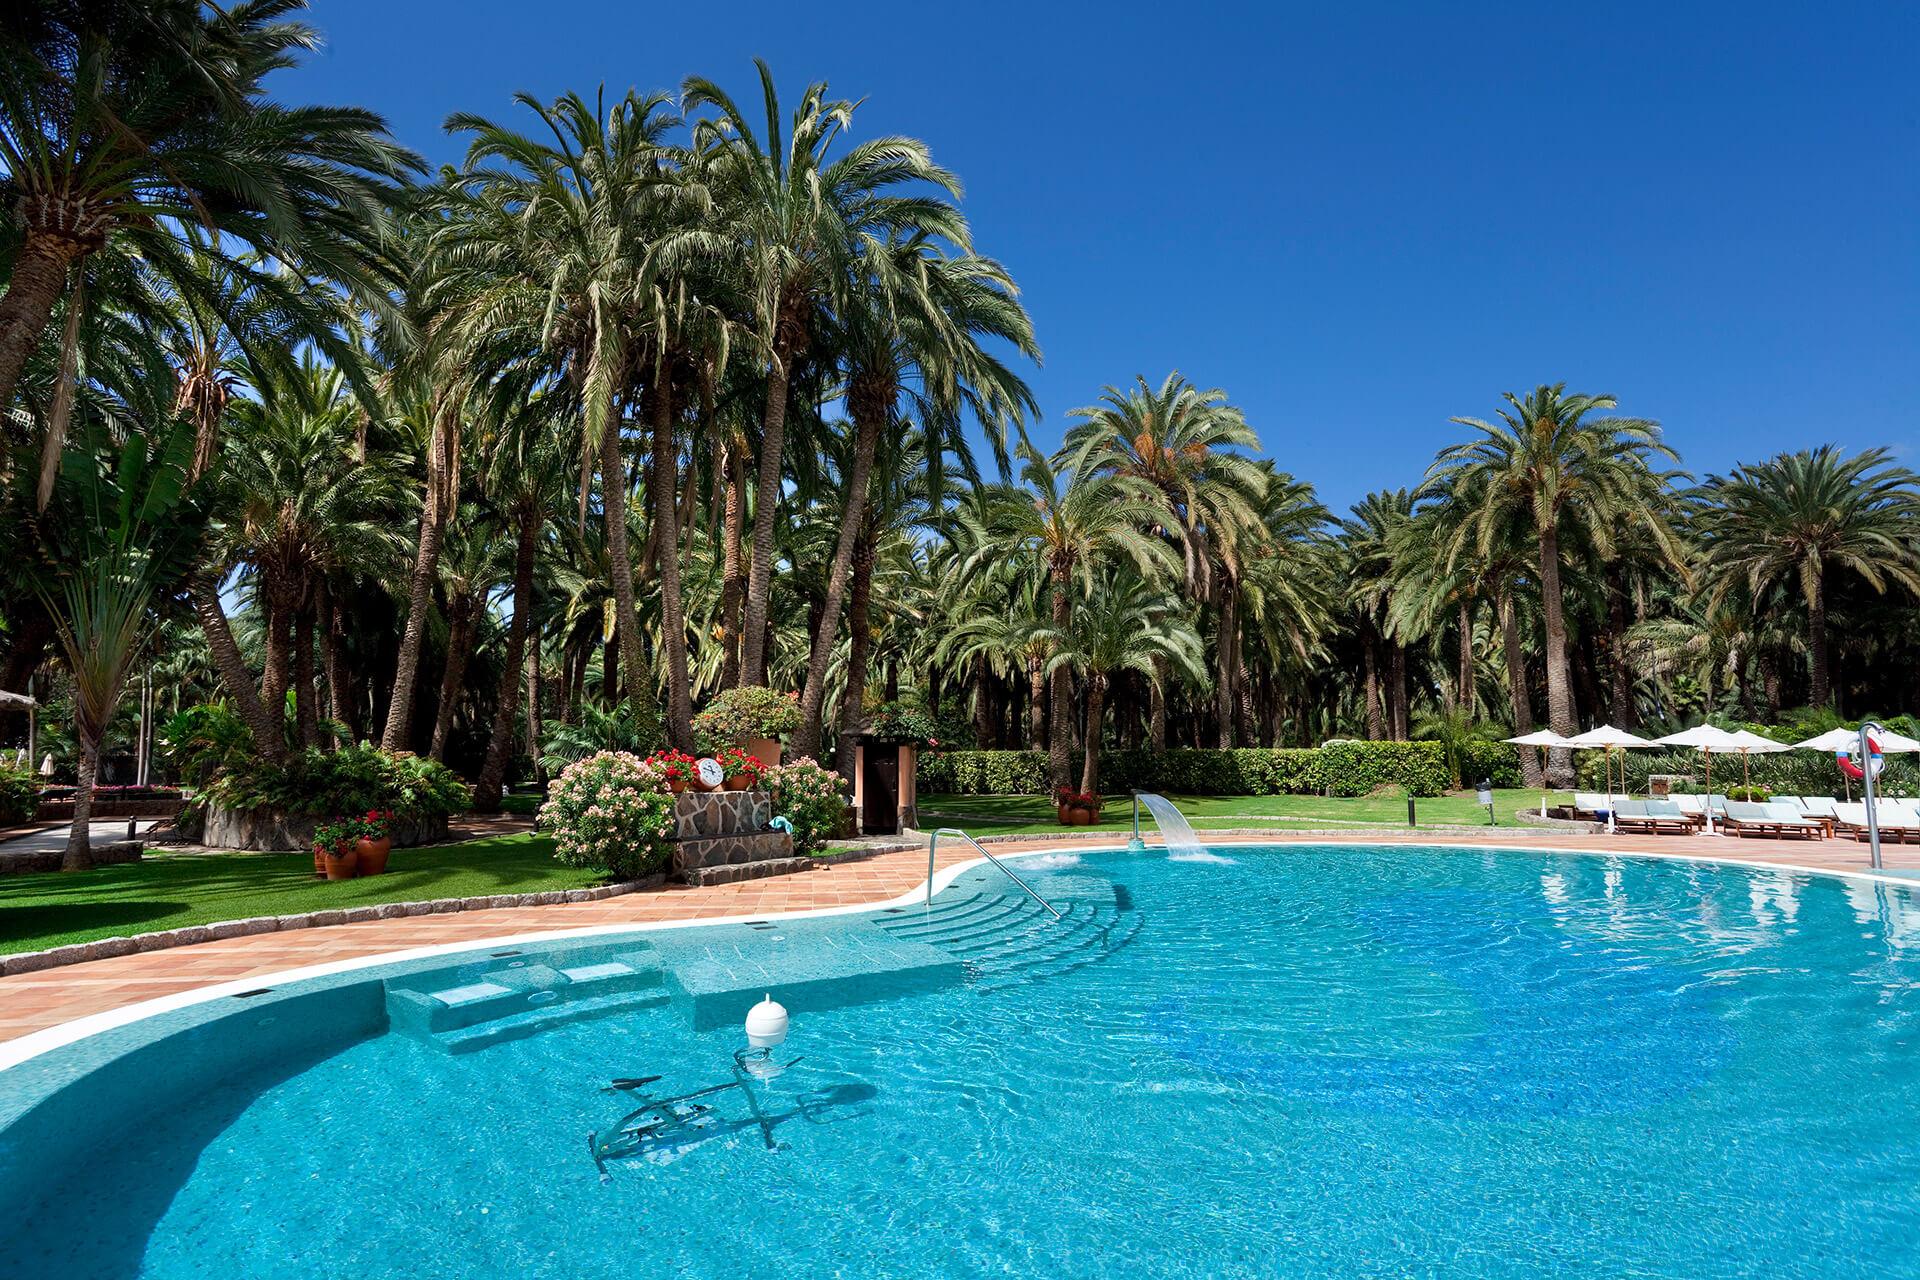 Gallery Spa Pools Seaside Palm Beach